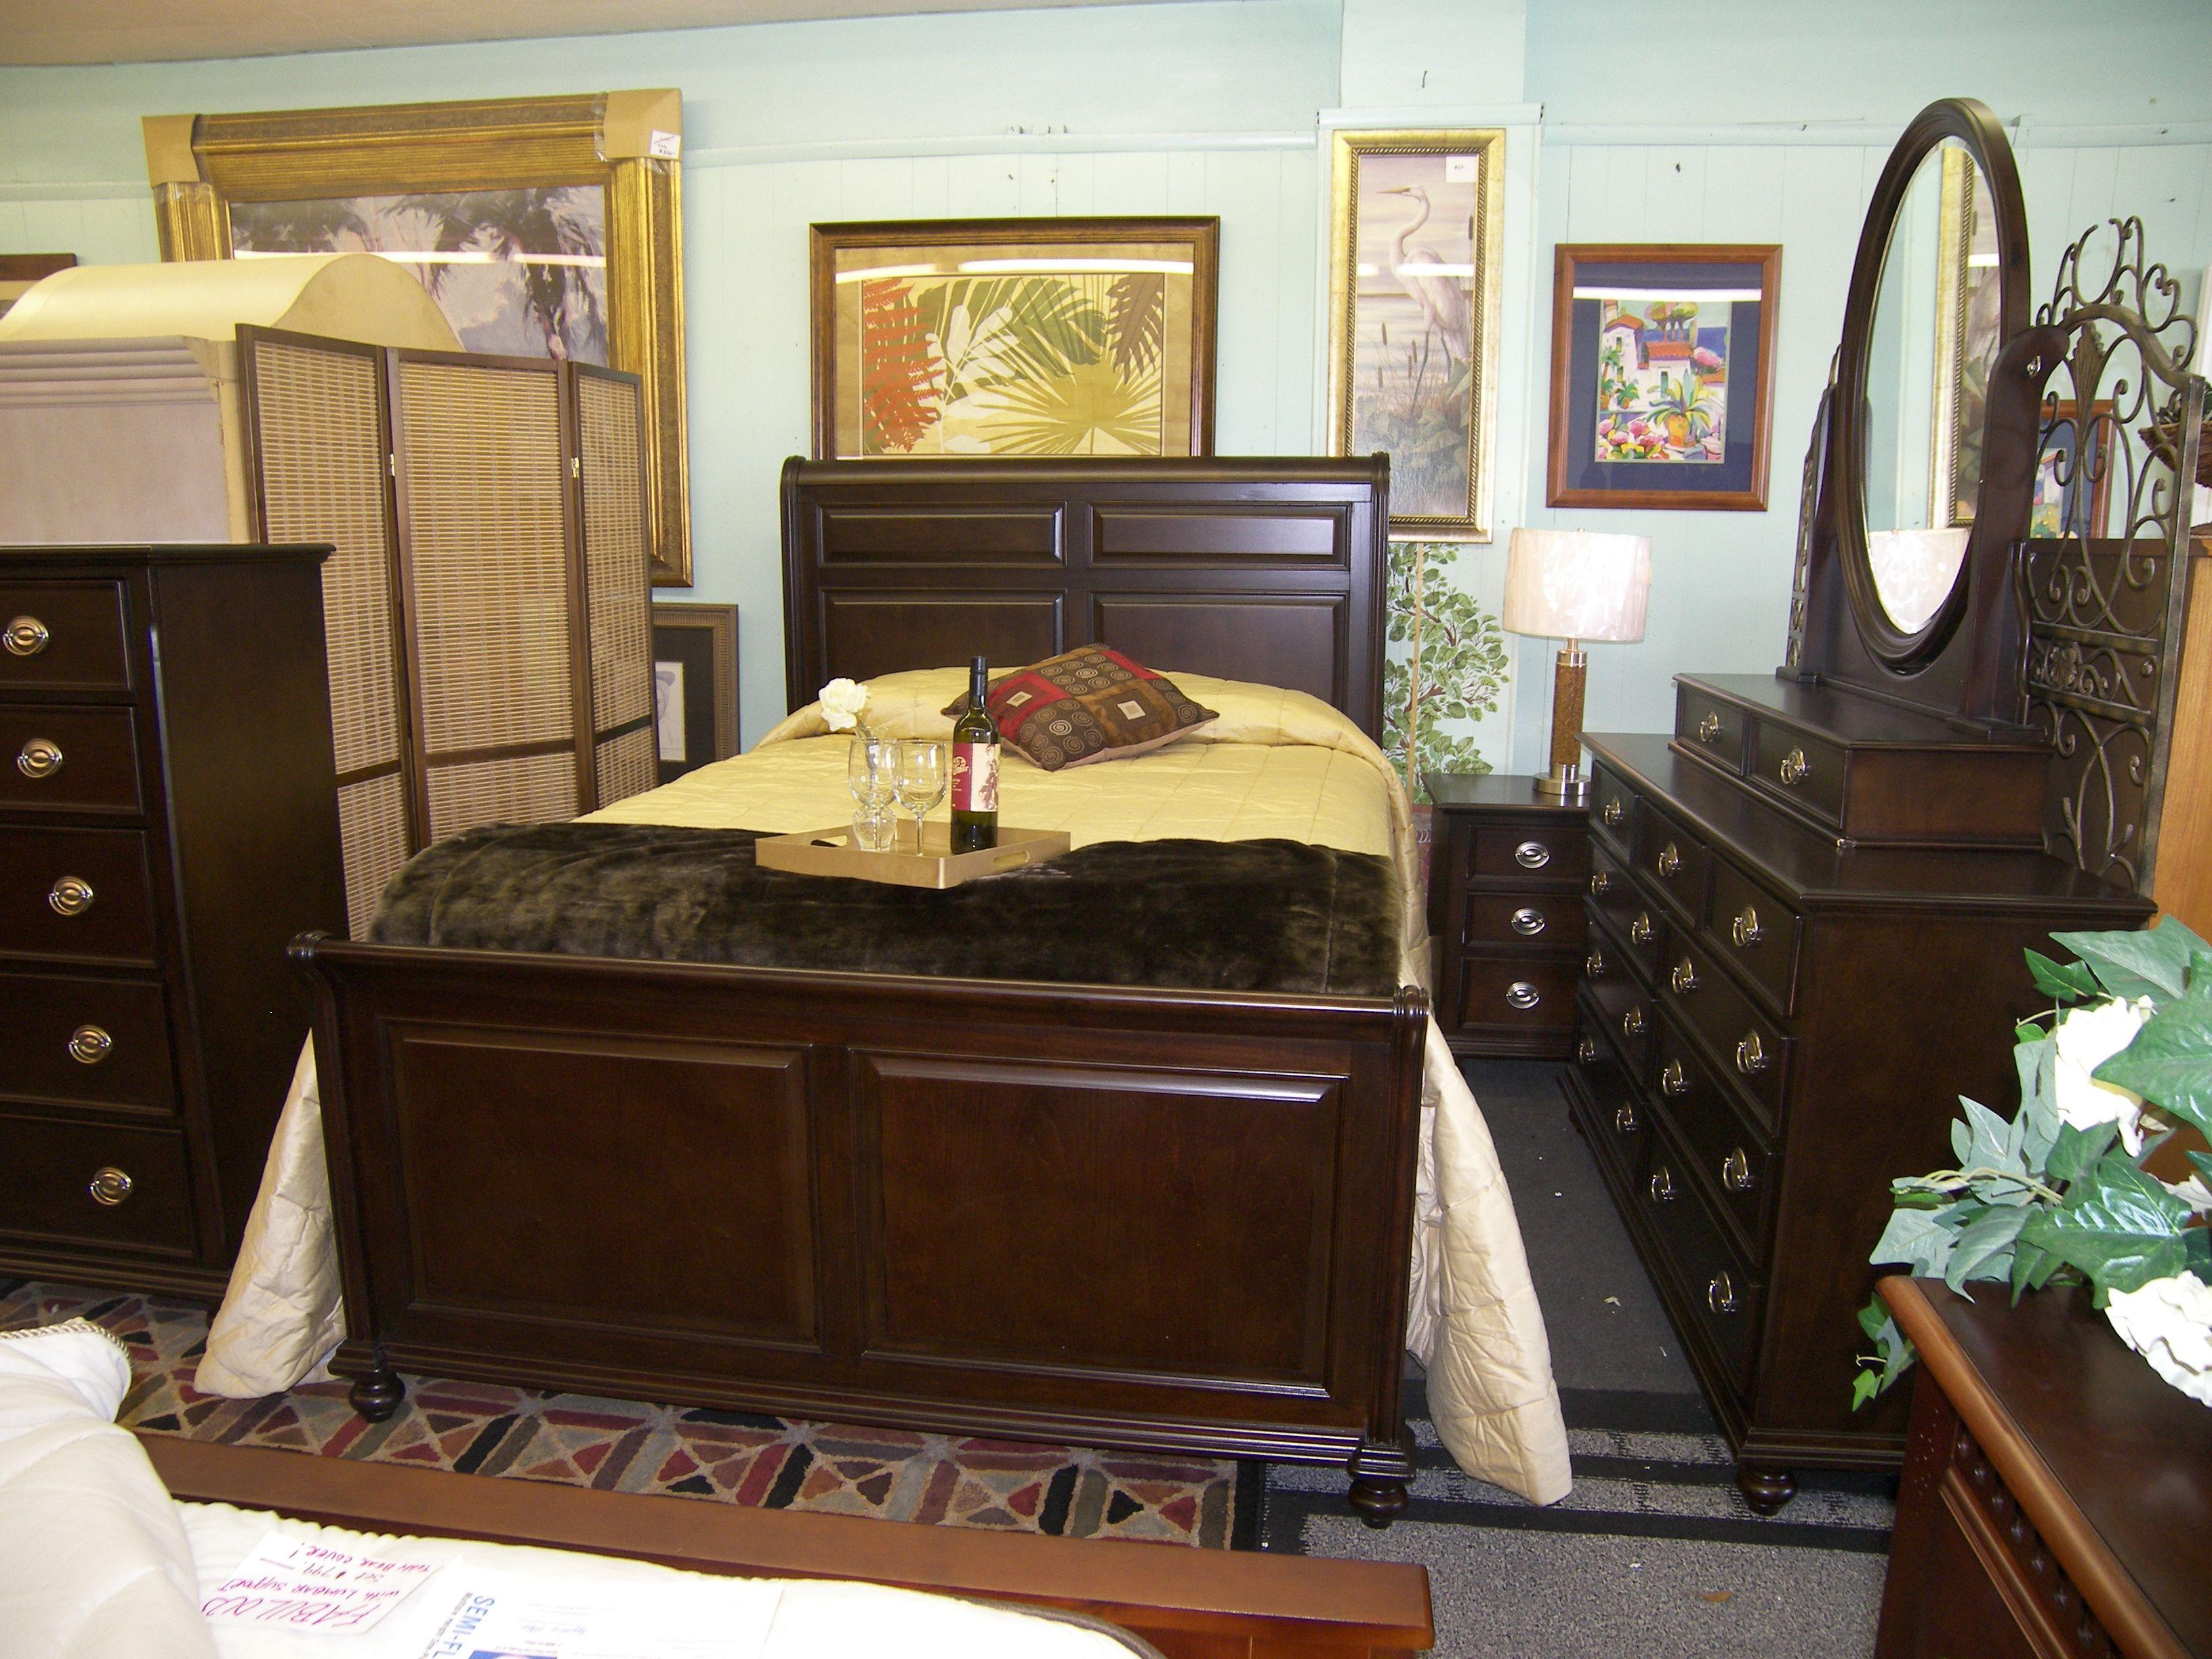 Furniture stores in st augustine fl  Furniture Consignment Shops  Jacksonville Florida  Florida